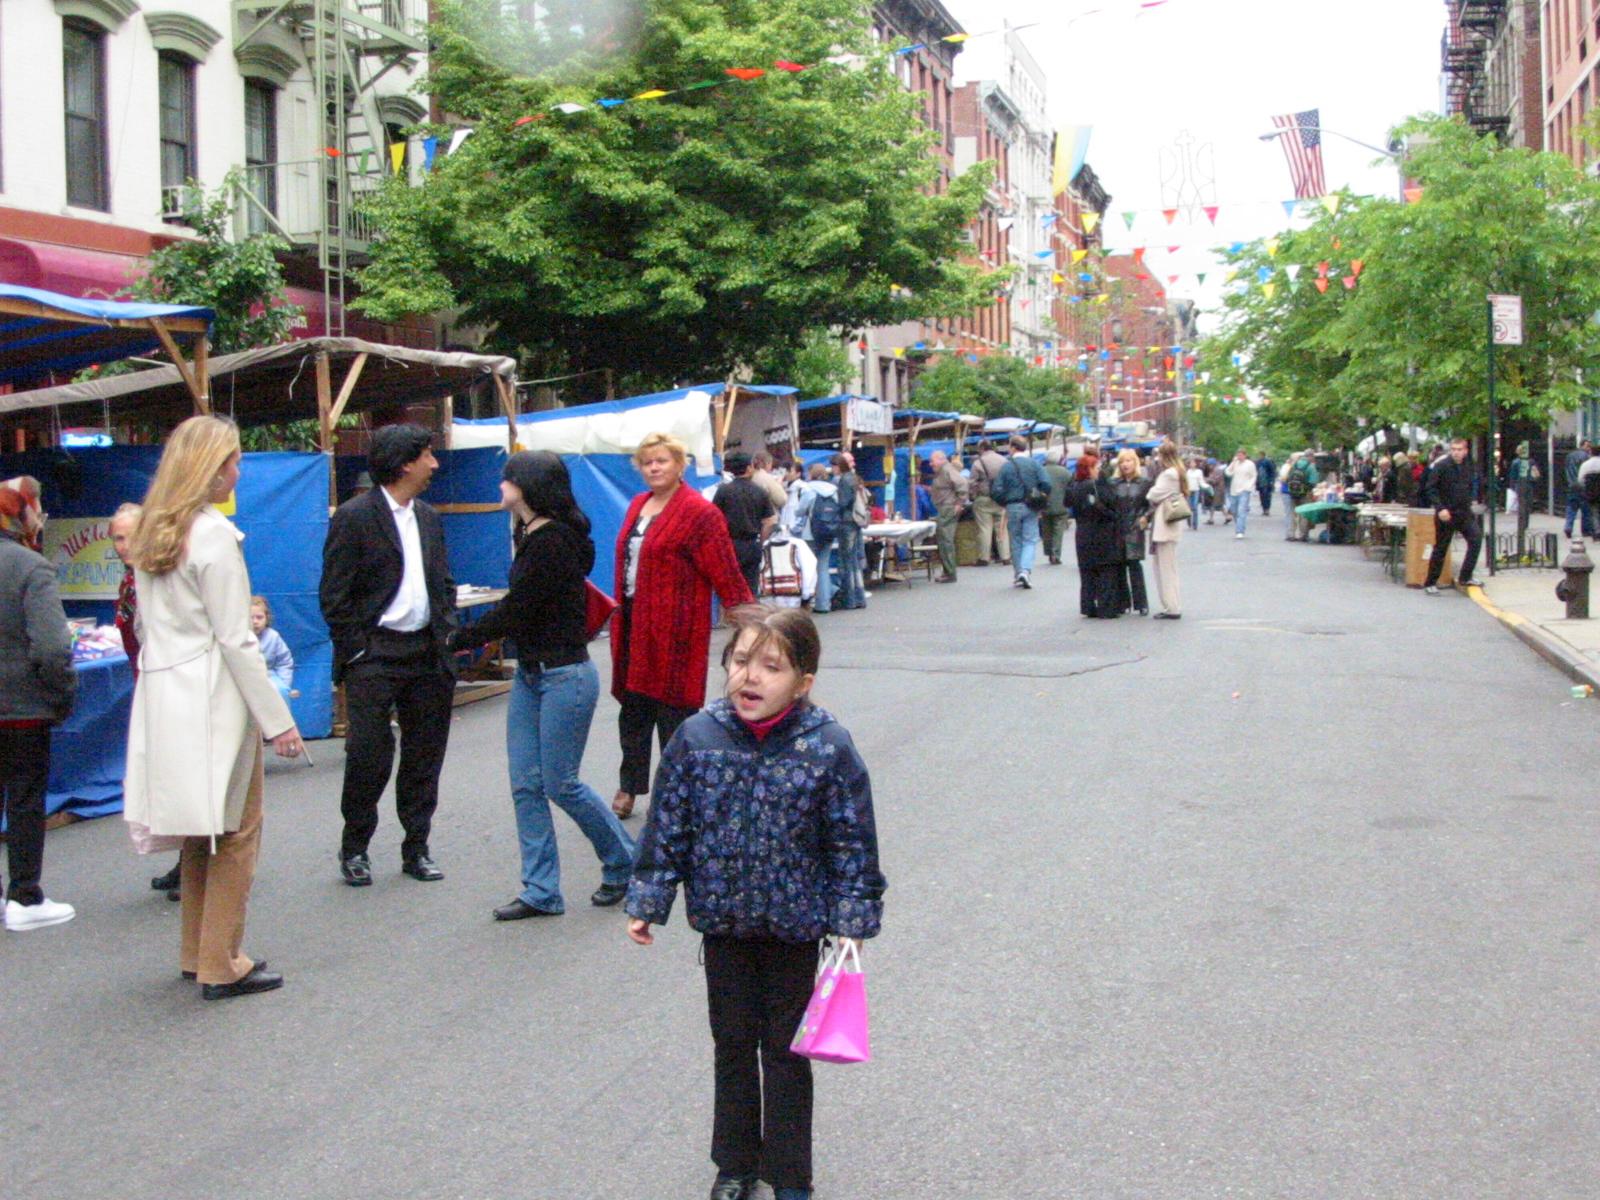 St. George Ukrainian Festival, E. 7th Street, New York City